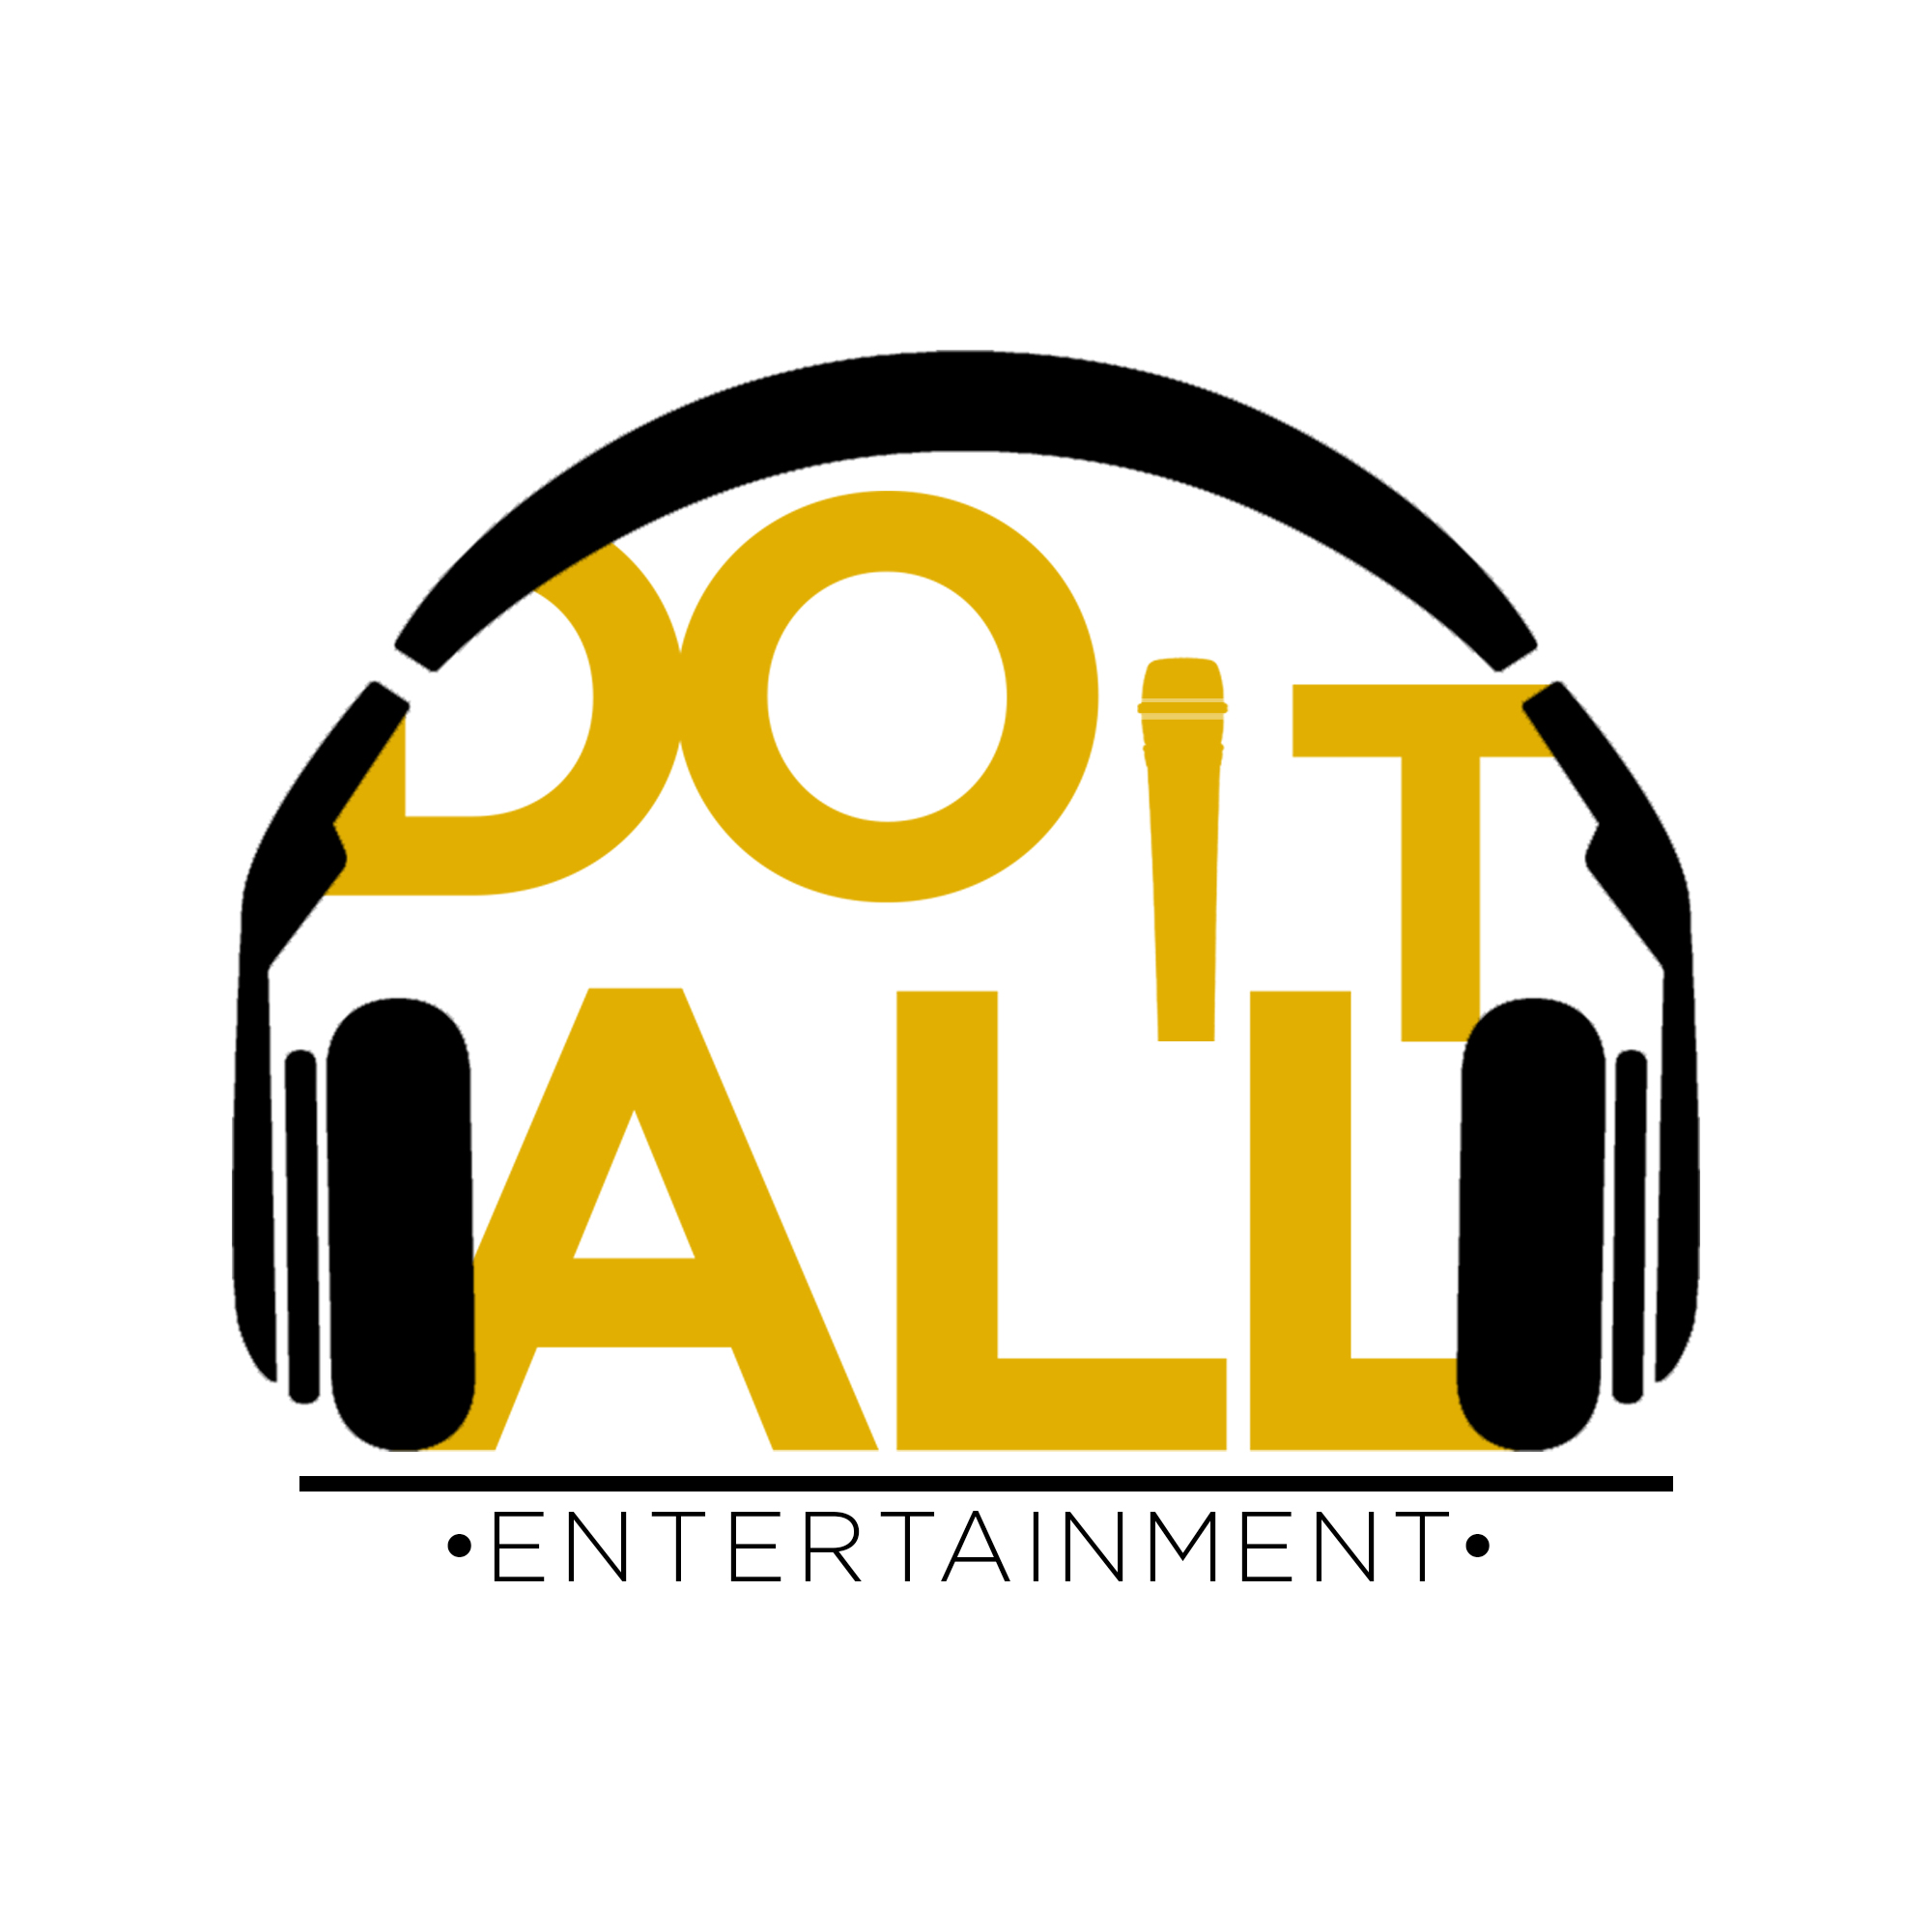 DoItAll Entertainment